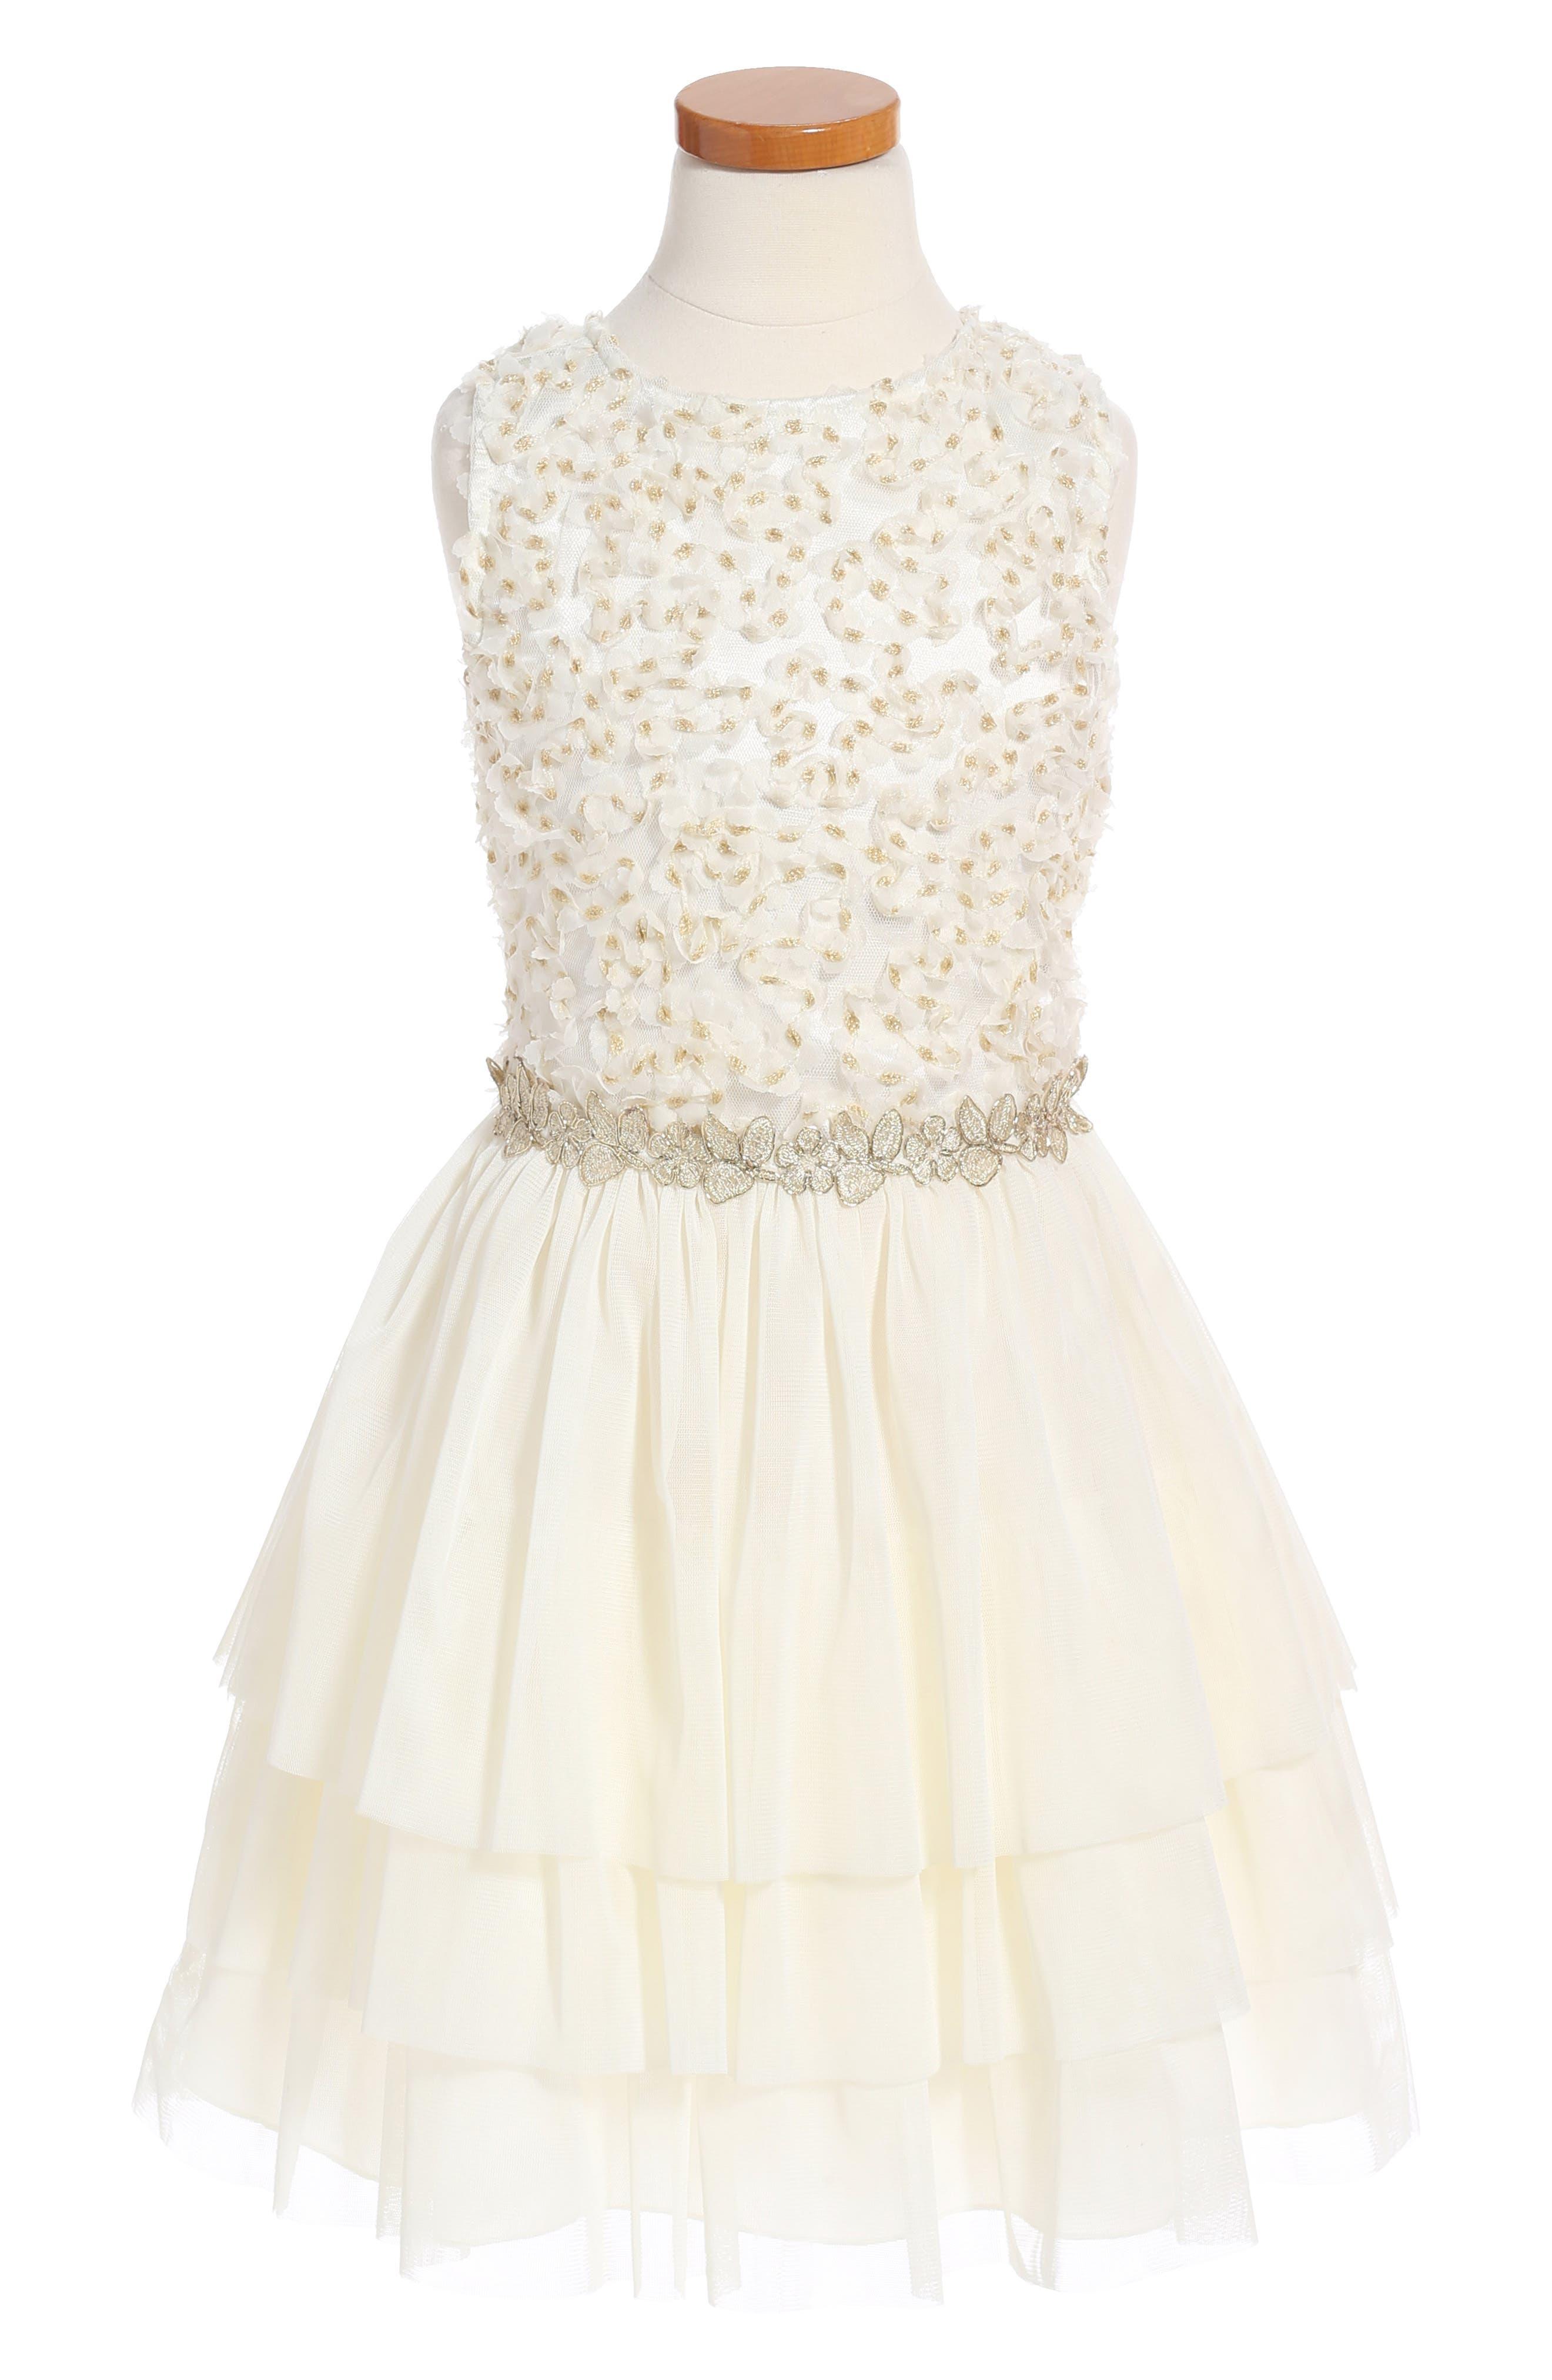 Nanette Lepore Appliquéd Mesh Dress (Big Girls)